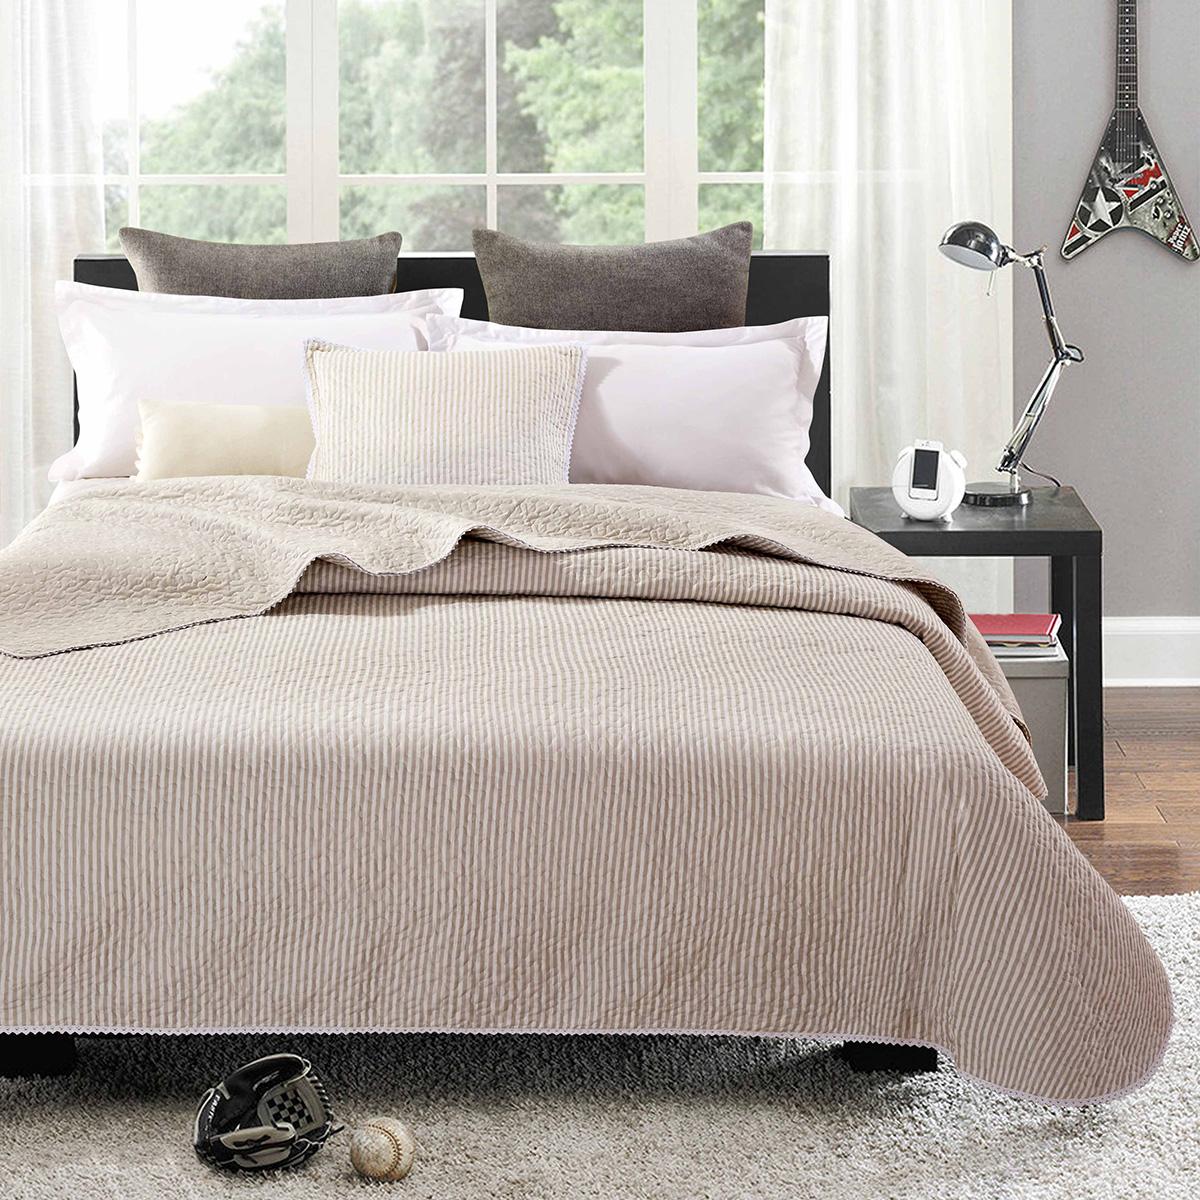 Utroligt Simone quiltet sengetæppe - Beige 250 x 270 cm - Vendbart design LC62